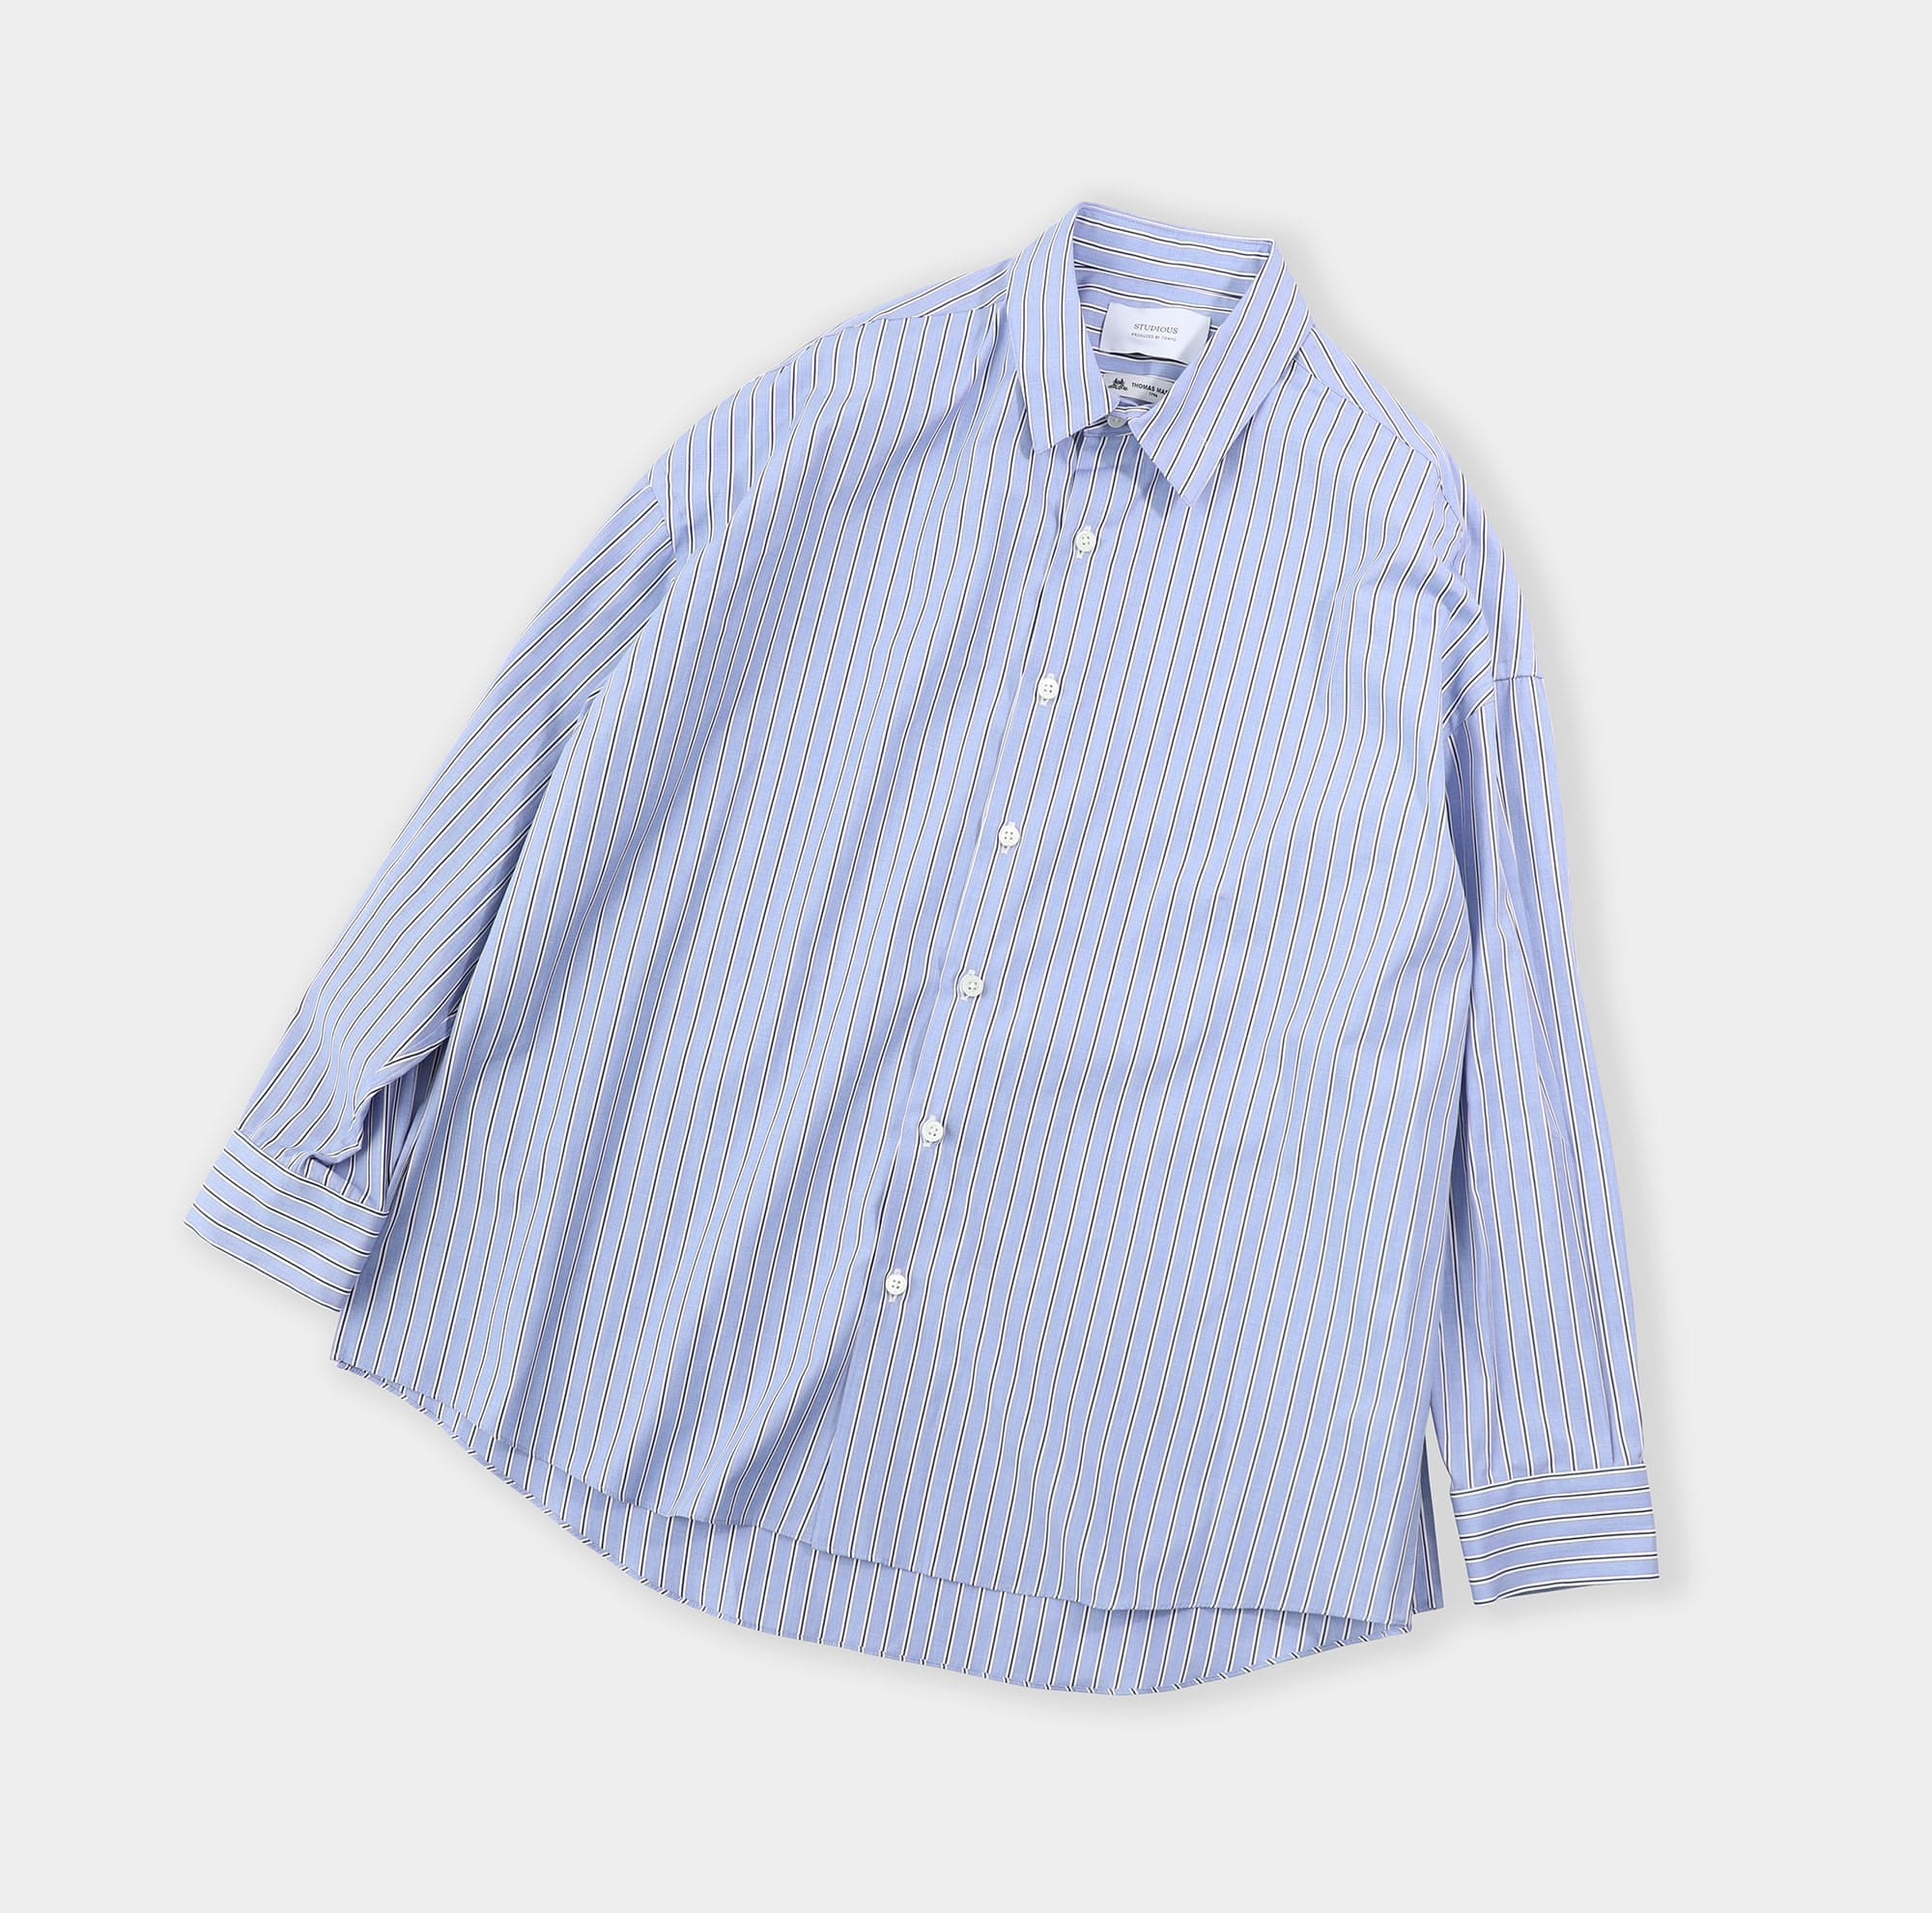 studious:public_shirts_shirts